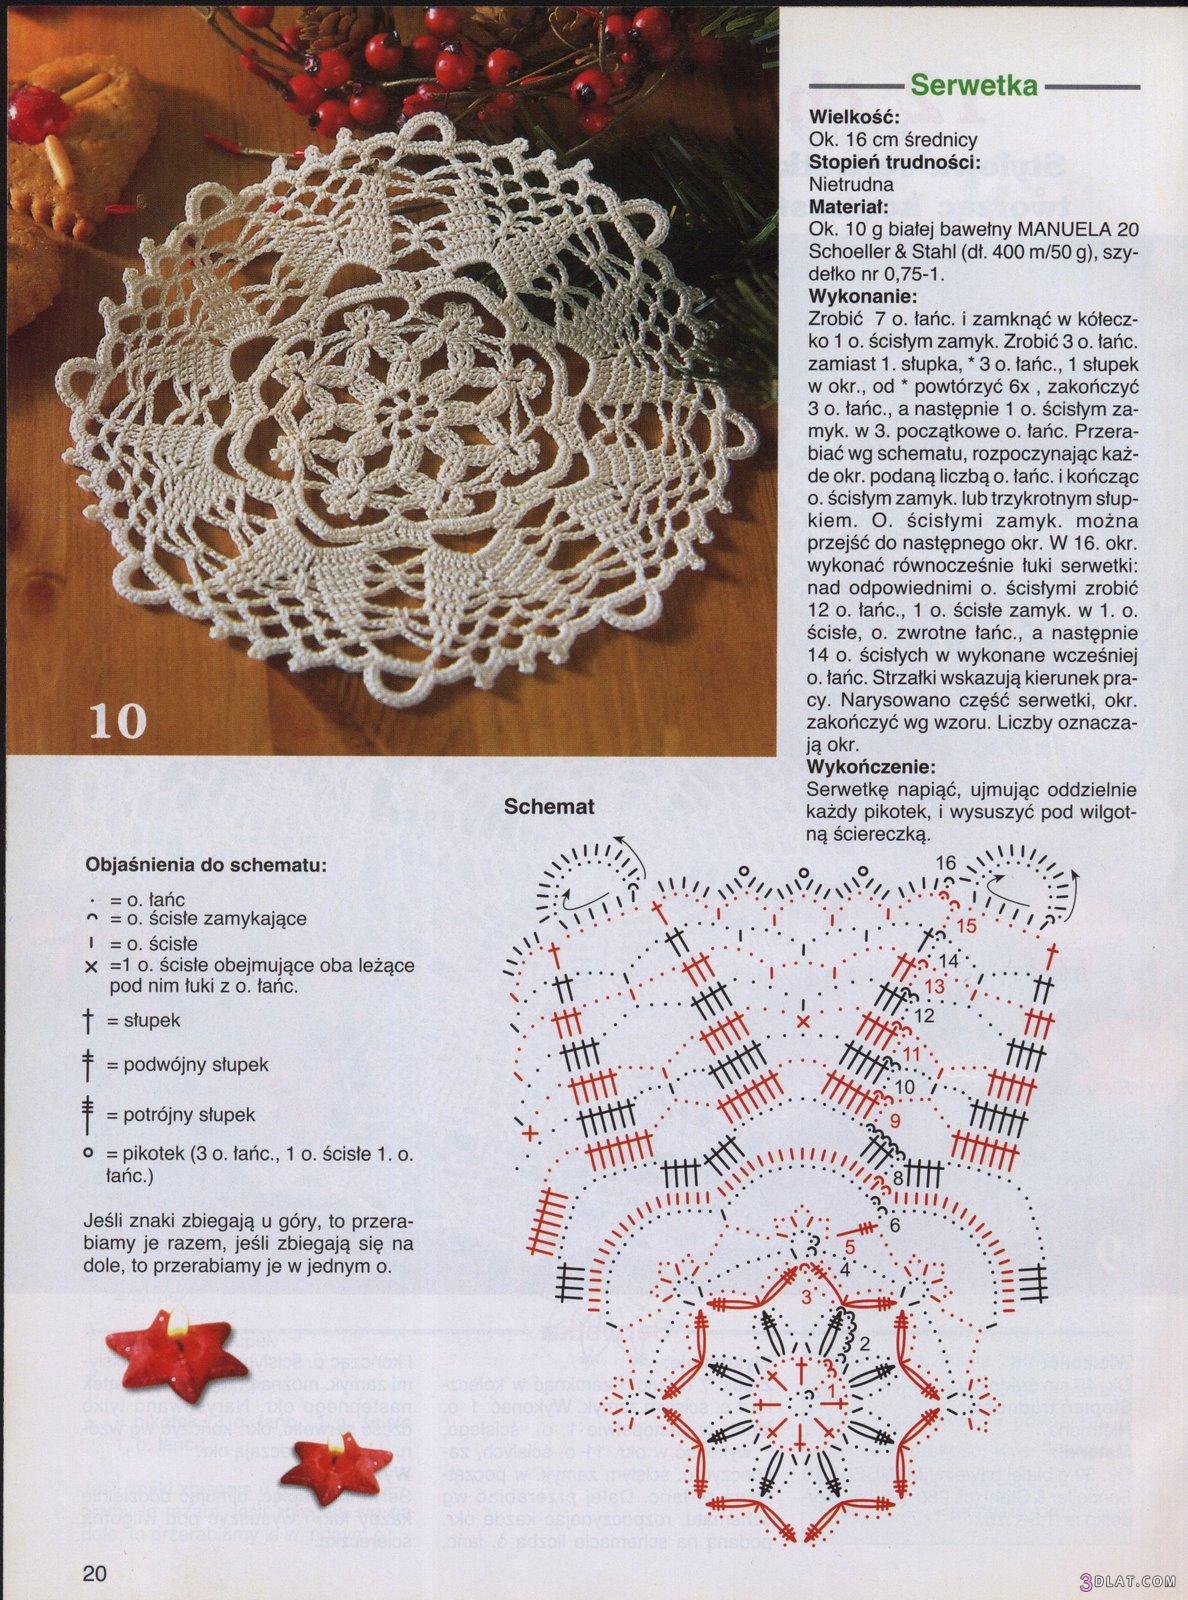 d142f2179 موسوعة مفارش كروشية دائرية بالباترون حصررري علي عدلات - زهرة الأوركيدا